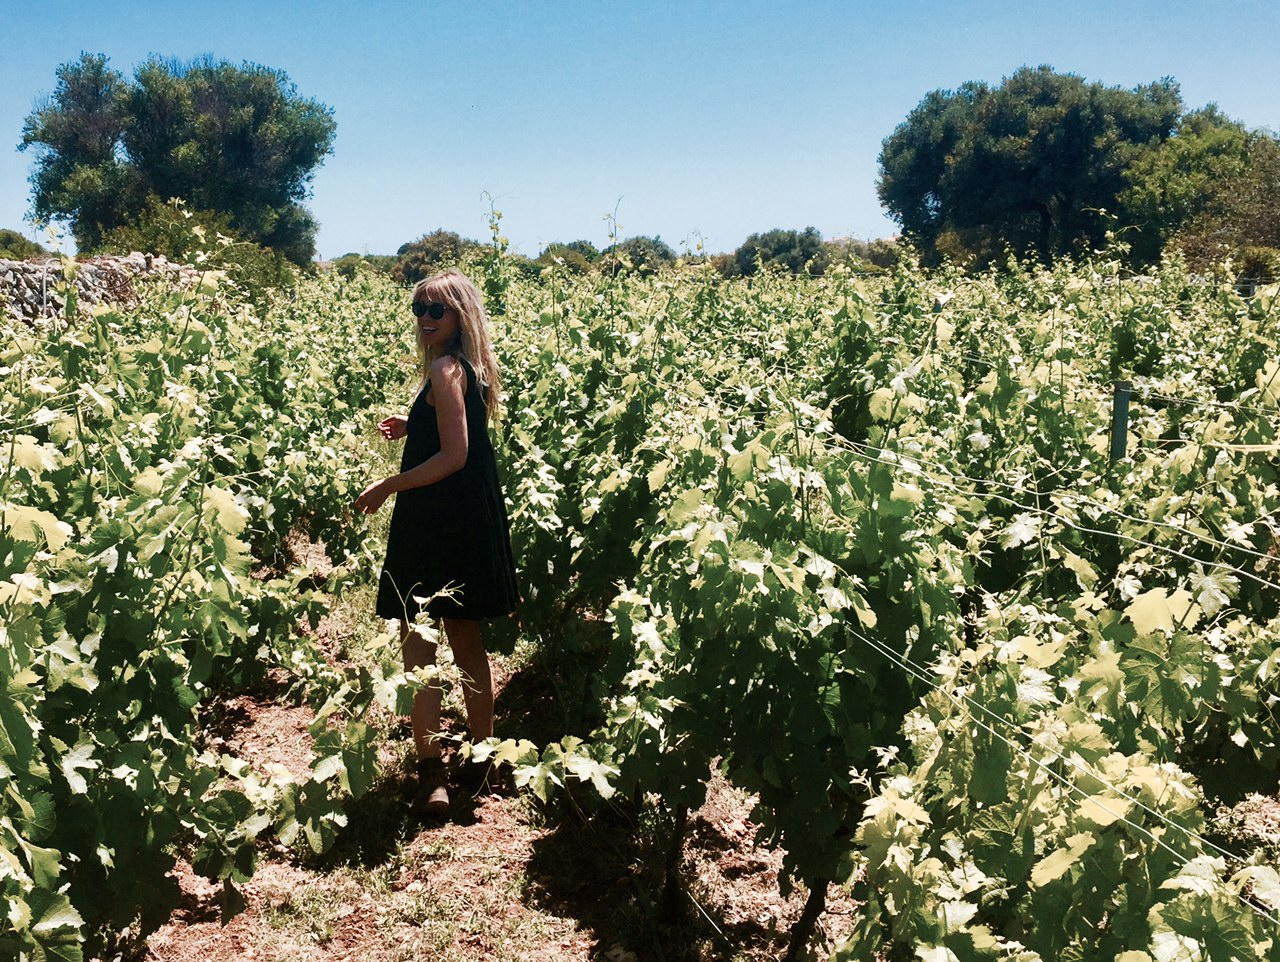 The vineyards at Binifadet